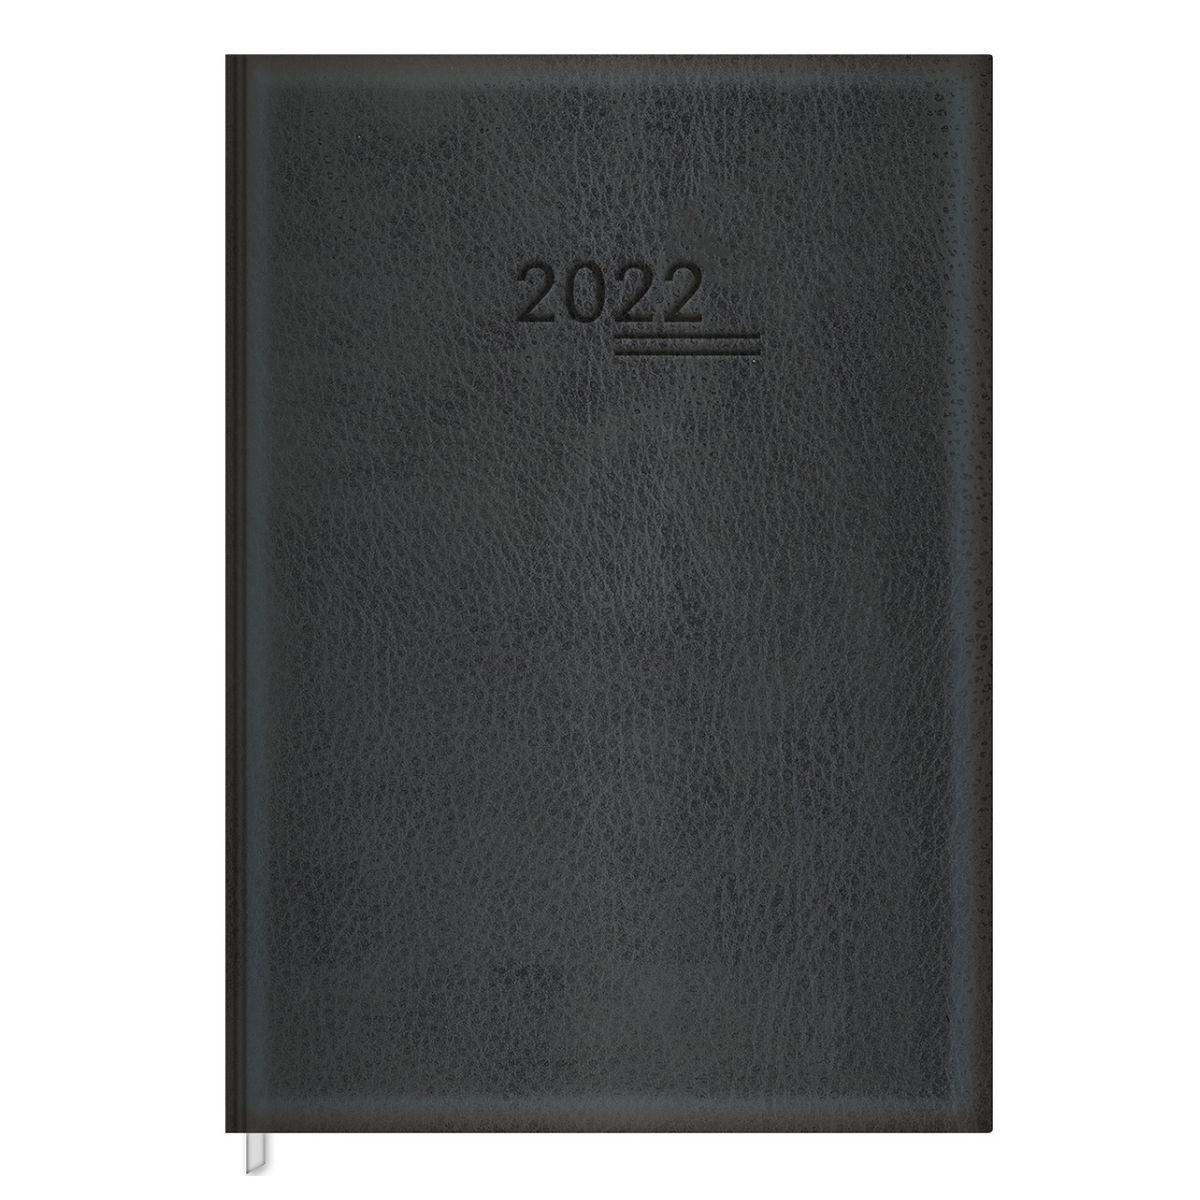 Agenda Executiva Cost Torino 2022 datado Preto - Tilibra